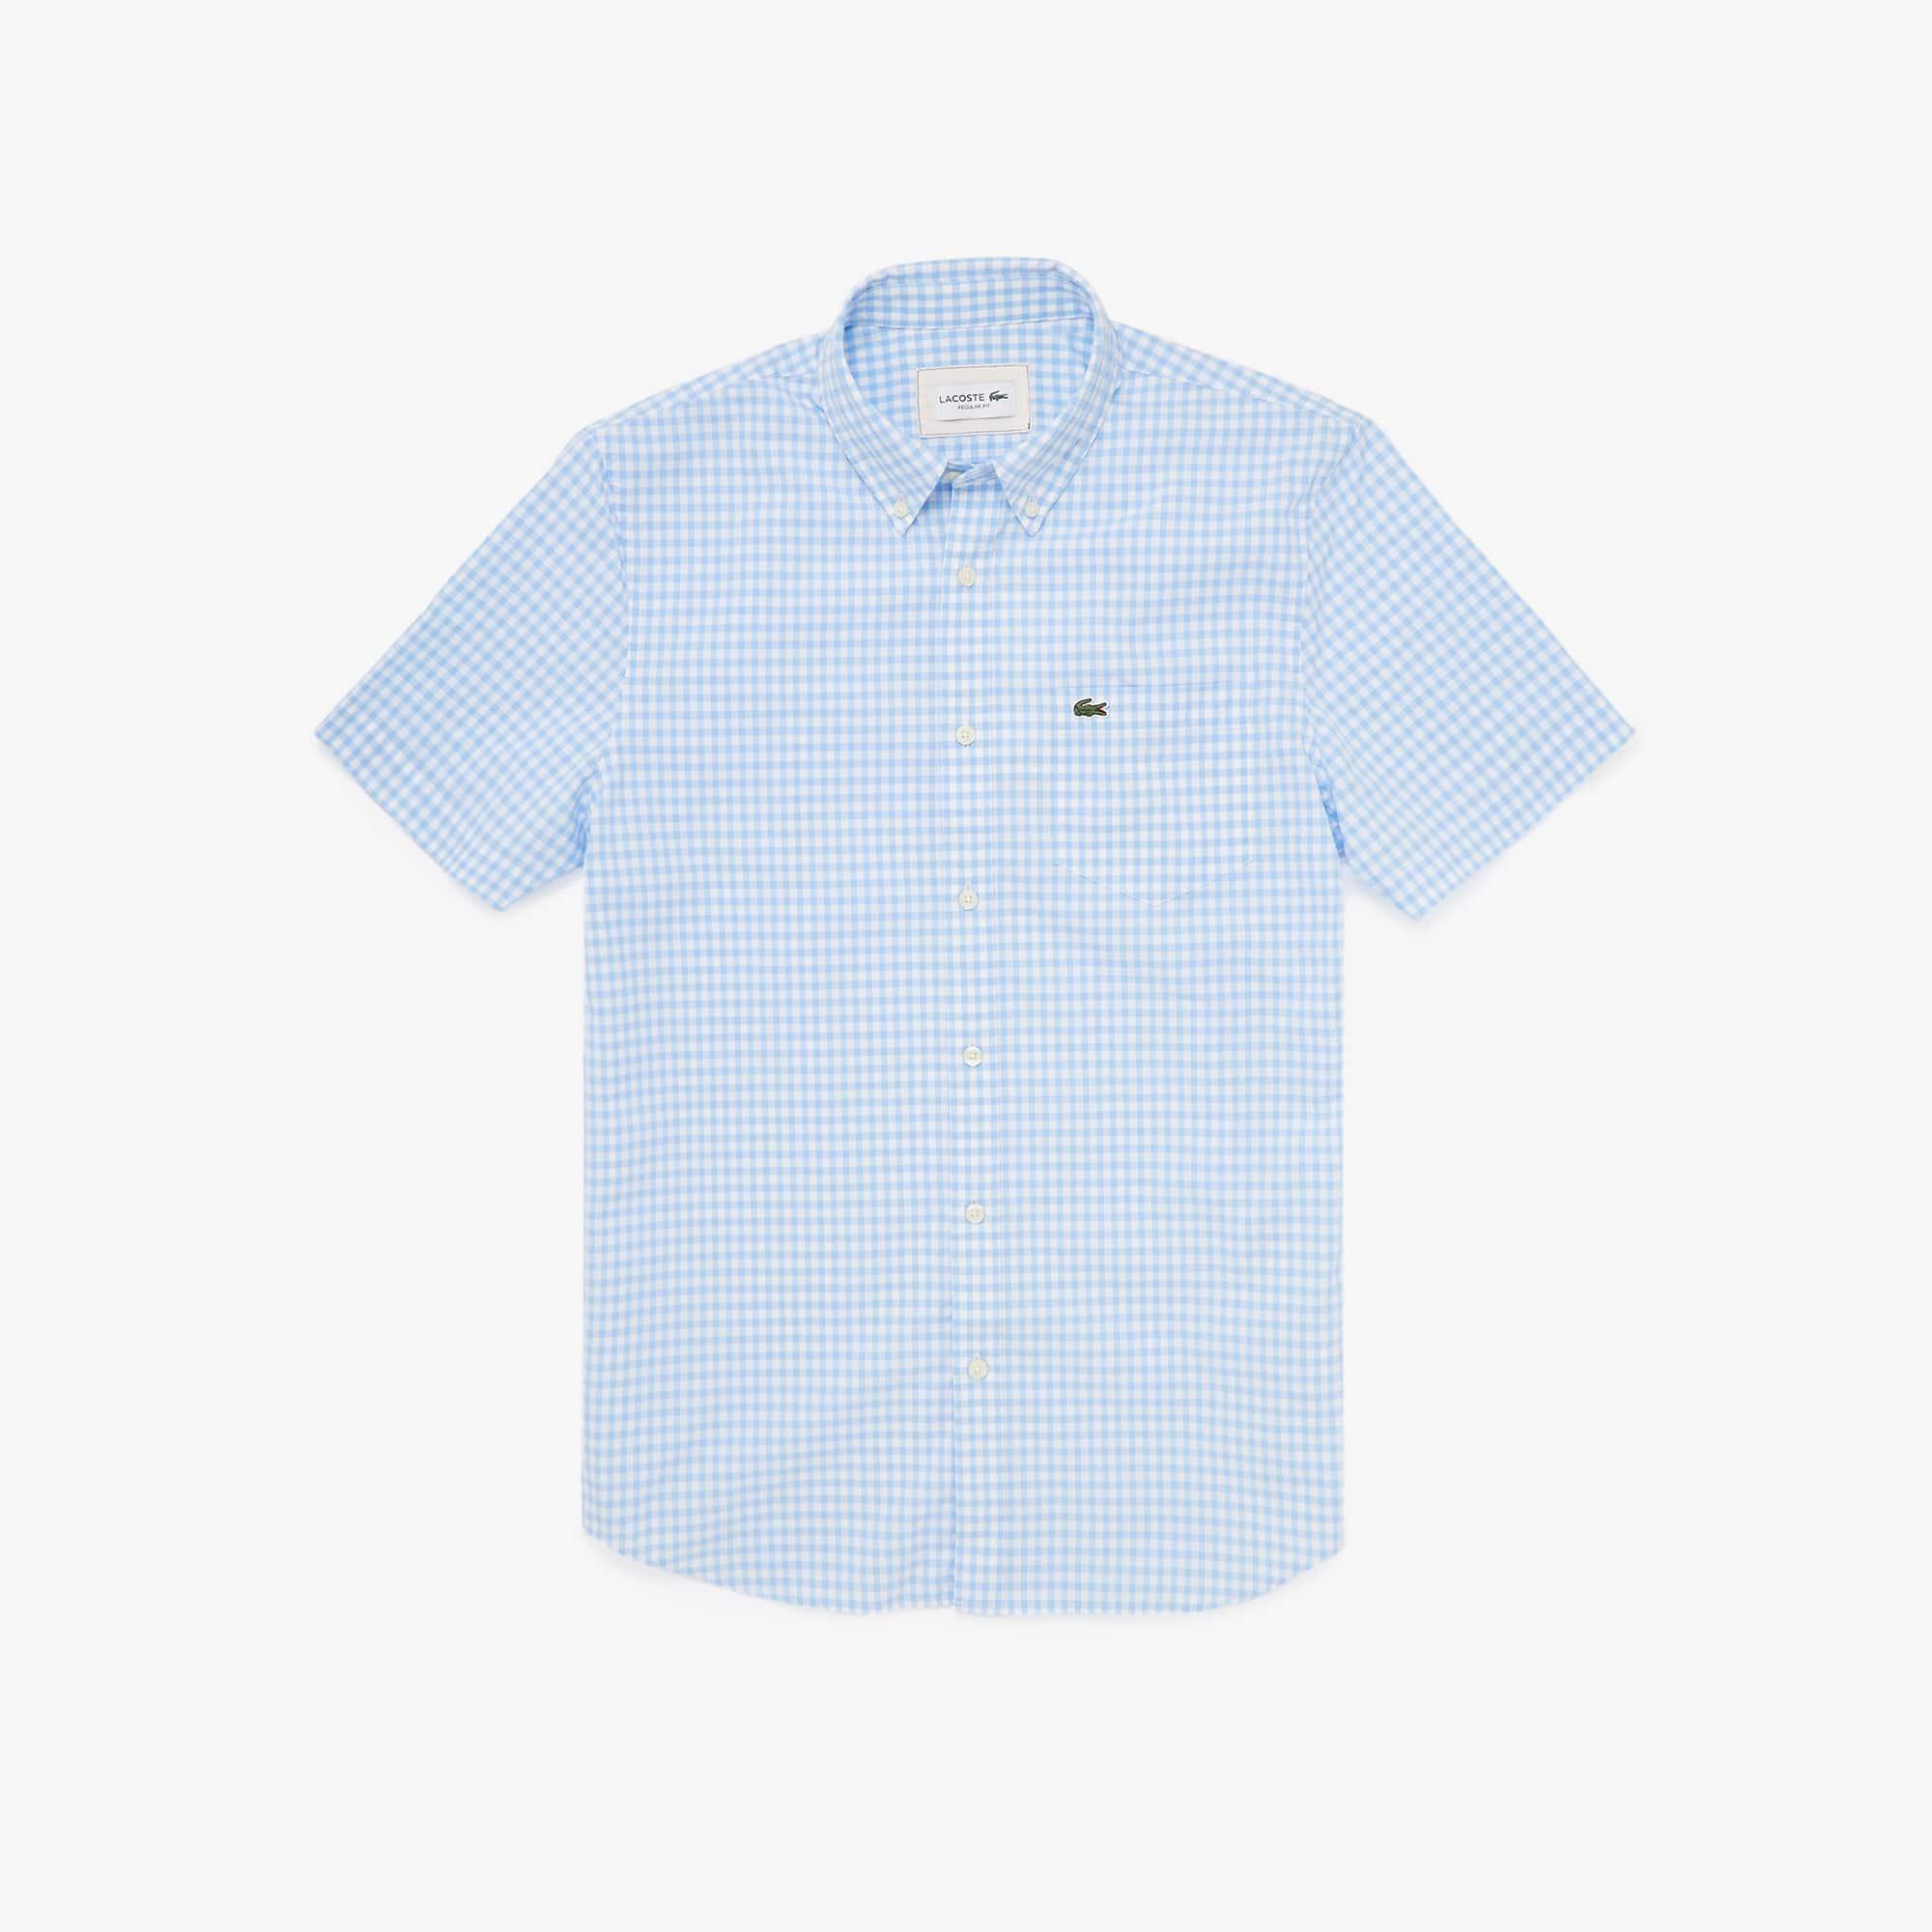 Lacoste Mens Regular Fit Gingham Poplin Shirt